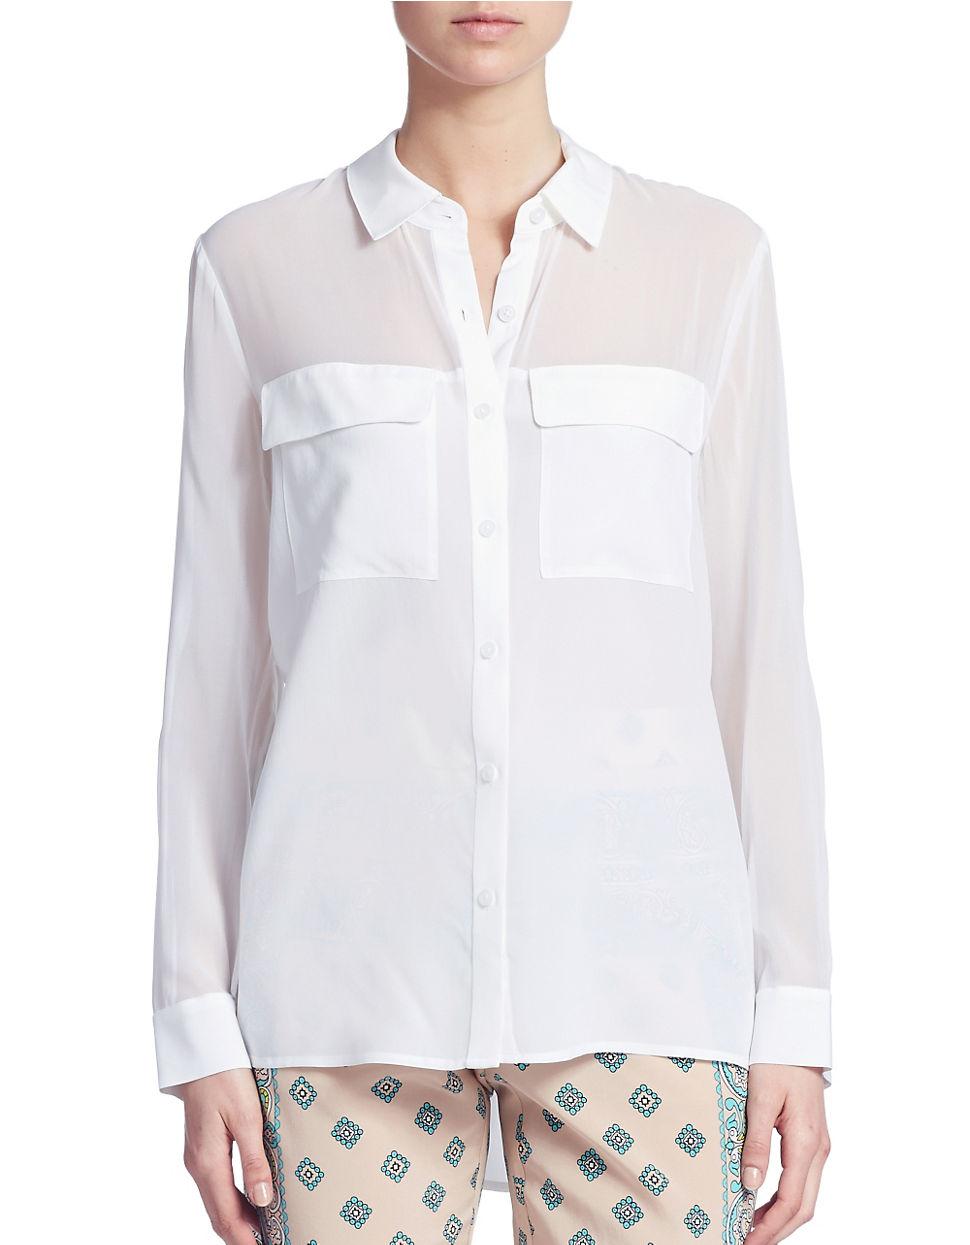 Dkny silk button down blouse in white lyst for Silk button down shirt